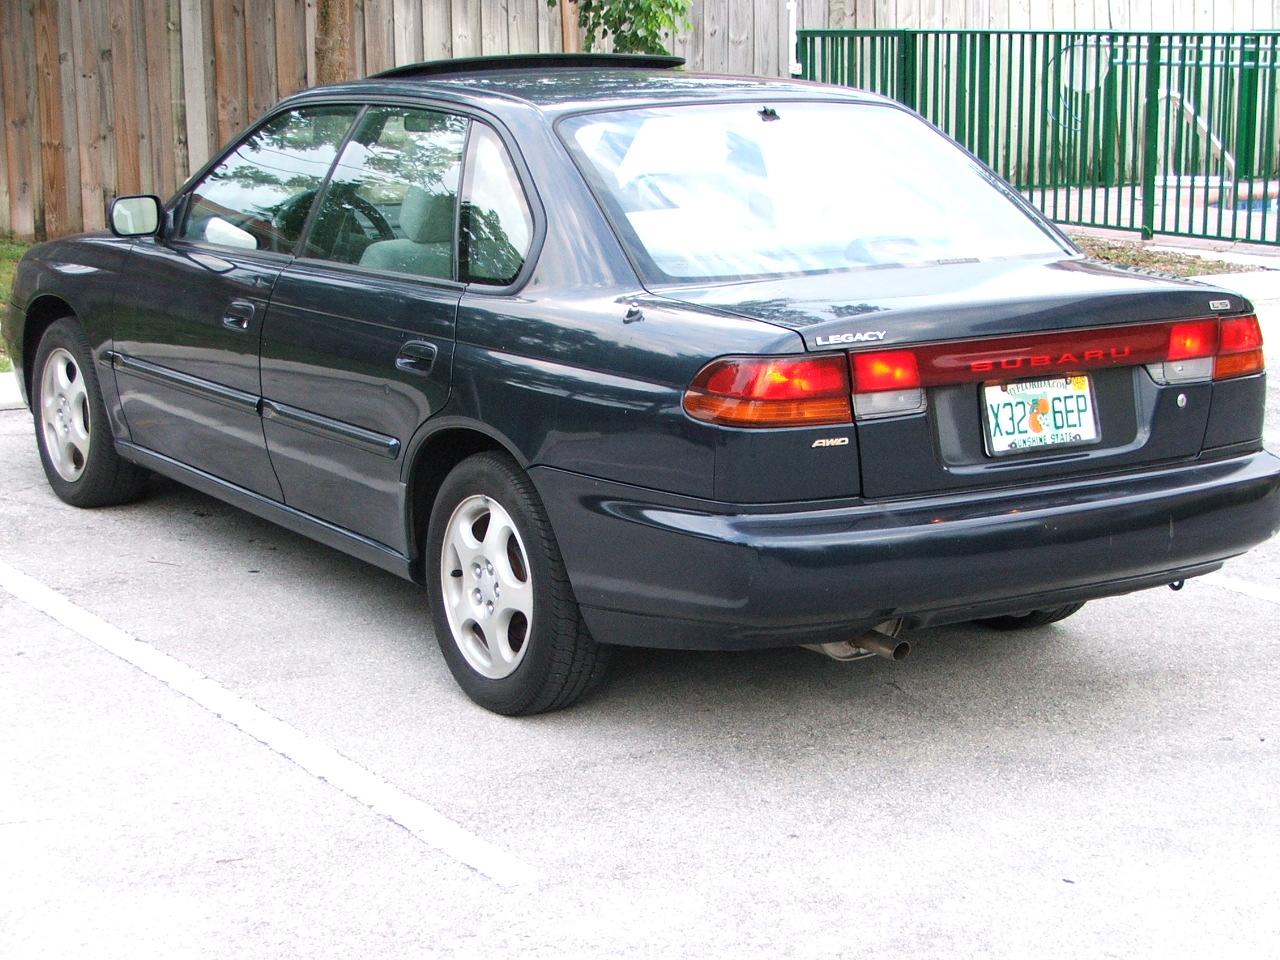 Buy used 1996 Subaru Legacy Postal Wagon 4-Door 2.2L in ...   1996 Subaru Legacy